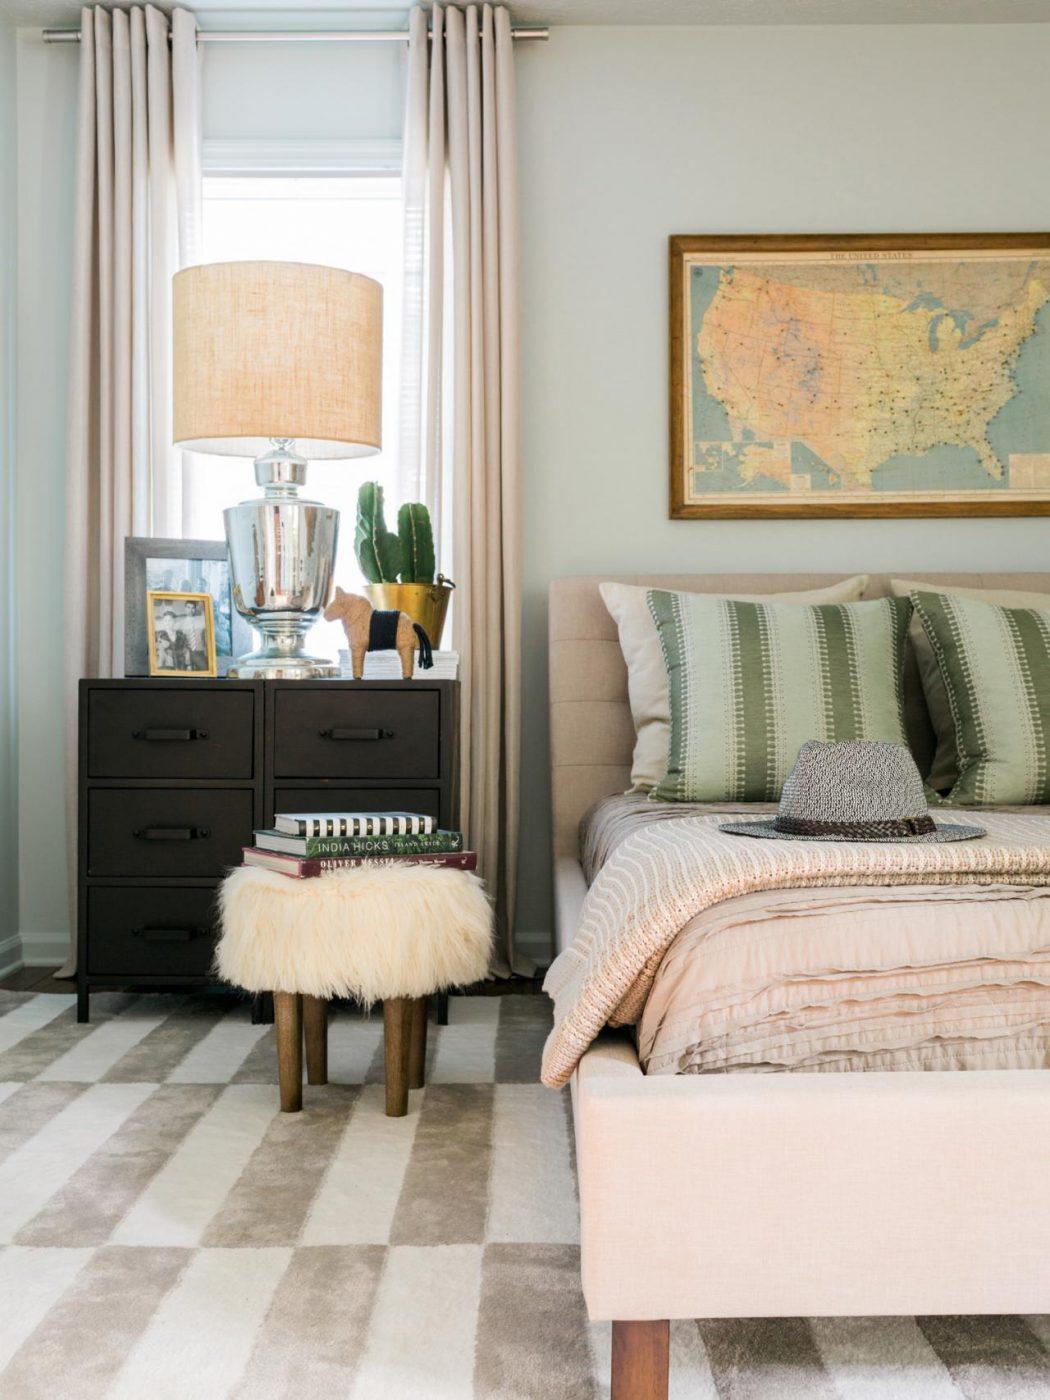 Adult-Edge3 Top 5 Girls' Bedroom Decoration Ideas in 2020